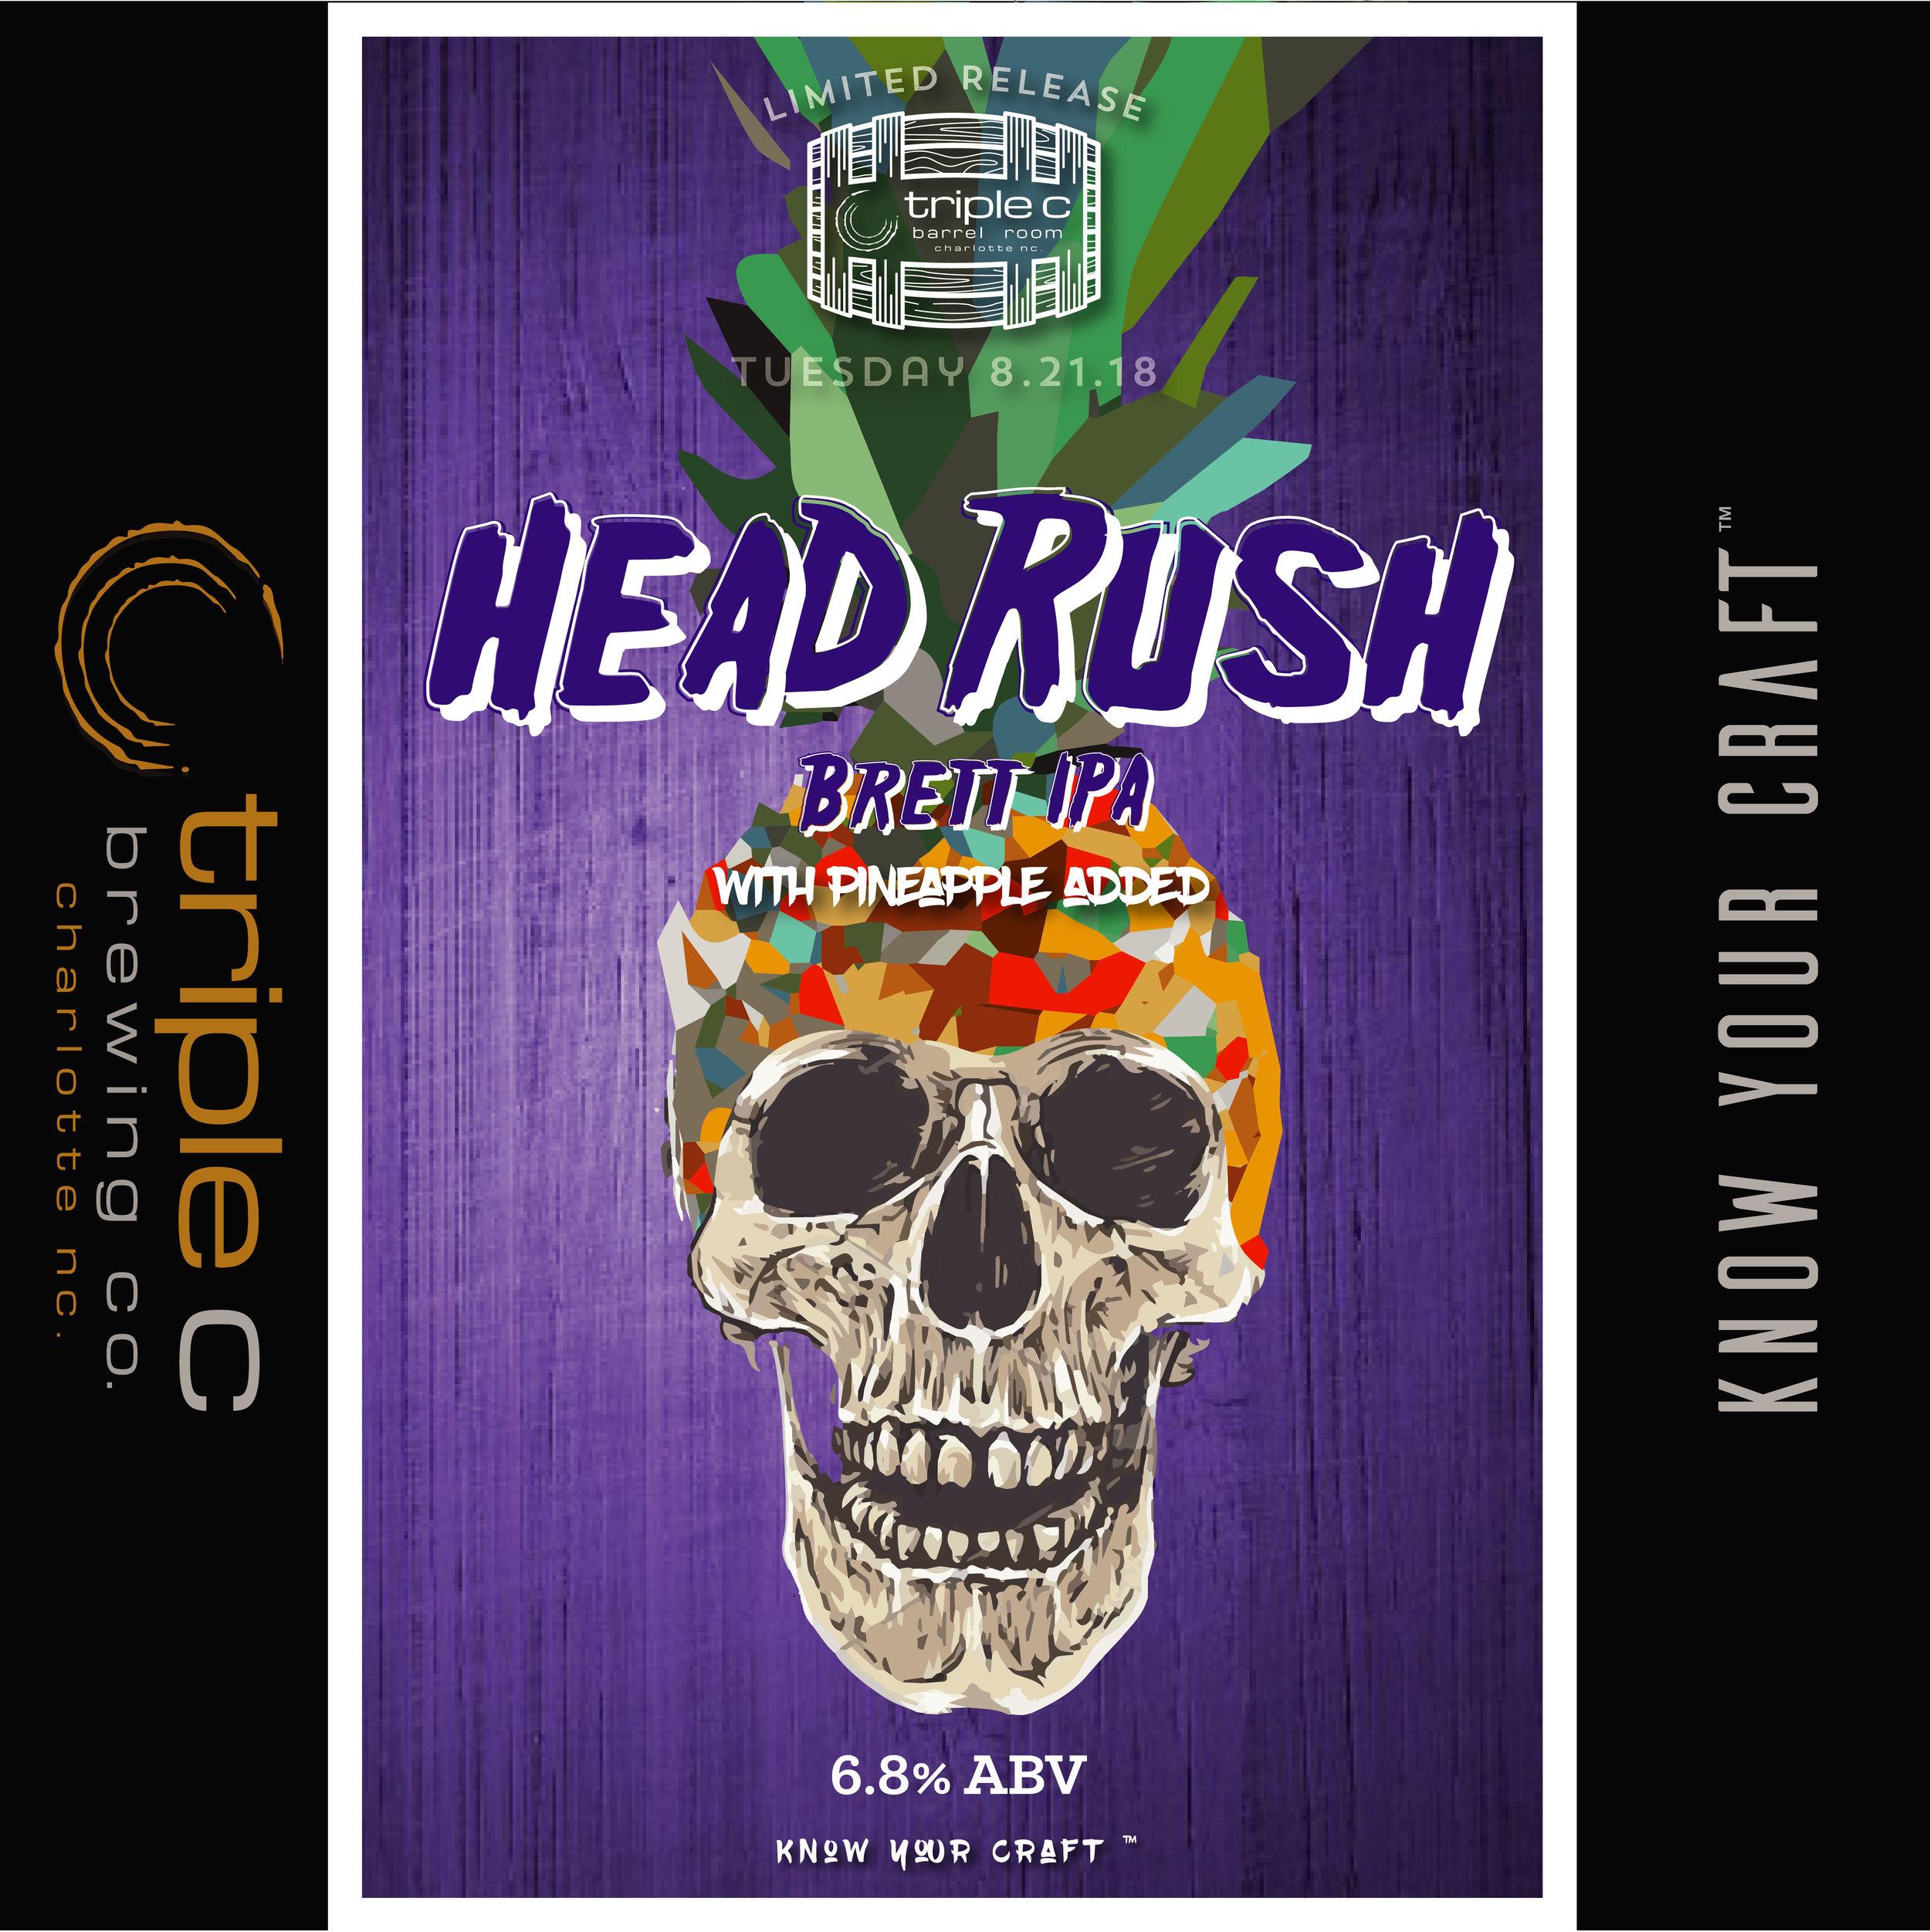 HeadRush_Media.jpg